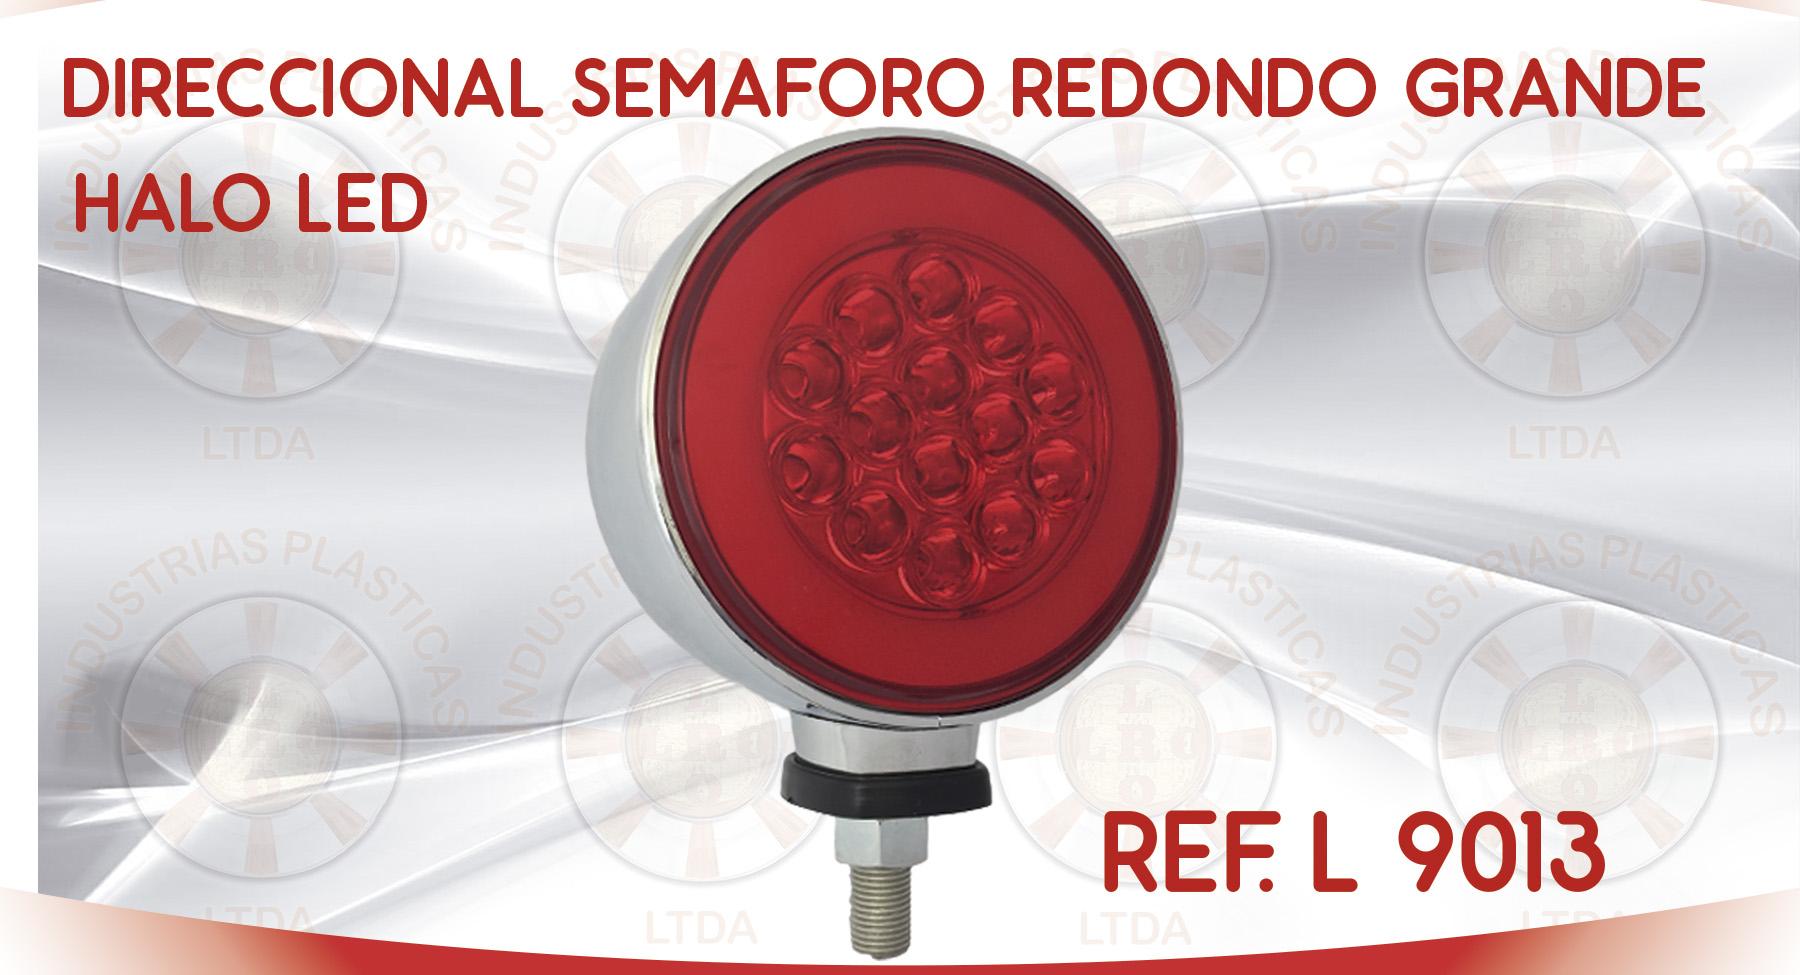 L 9013 DIRECCONAL SEMAFORO REDONDO GRANDE HALO LED